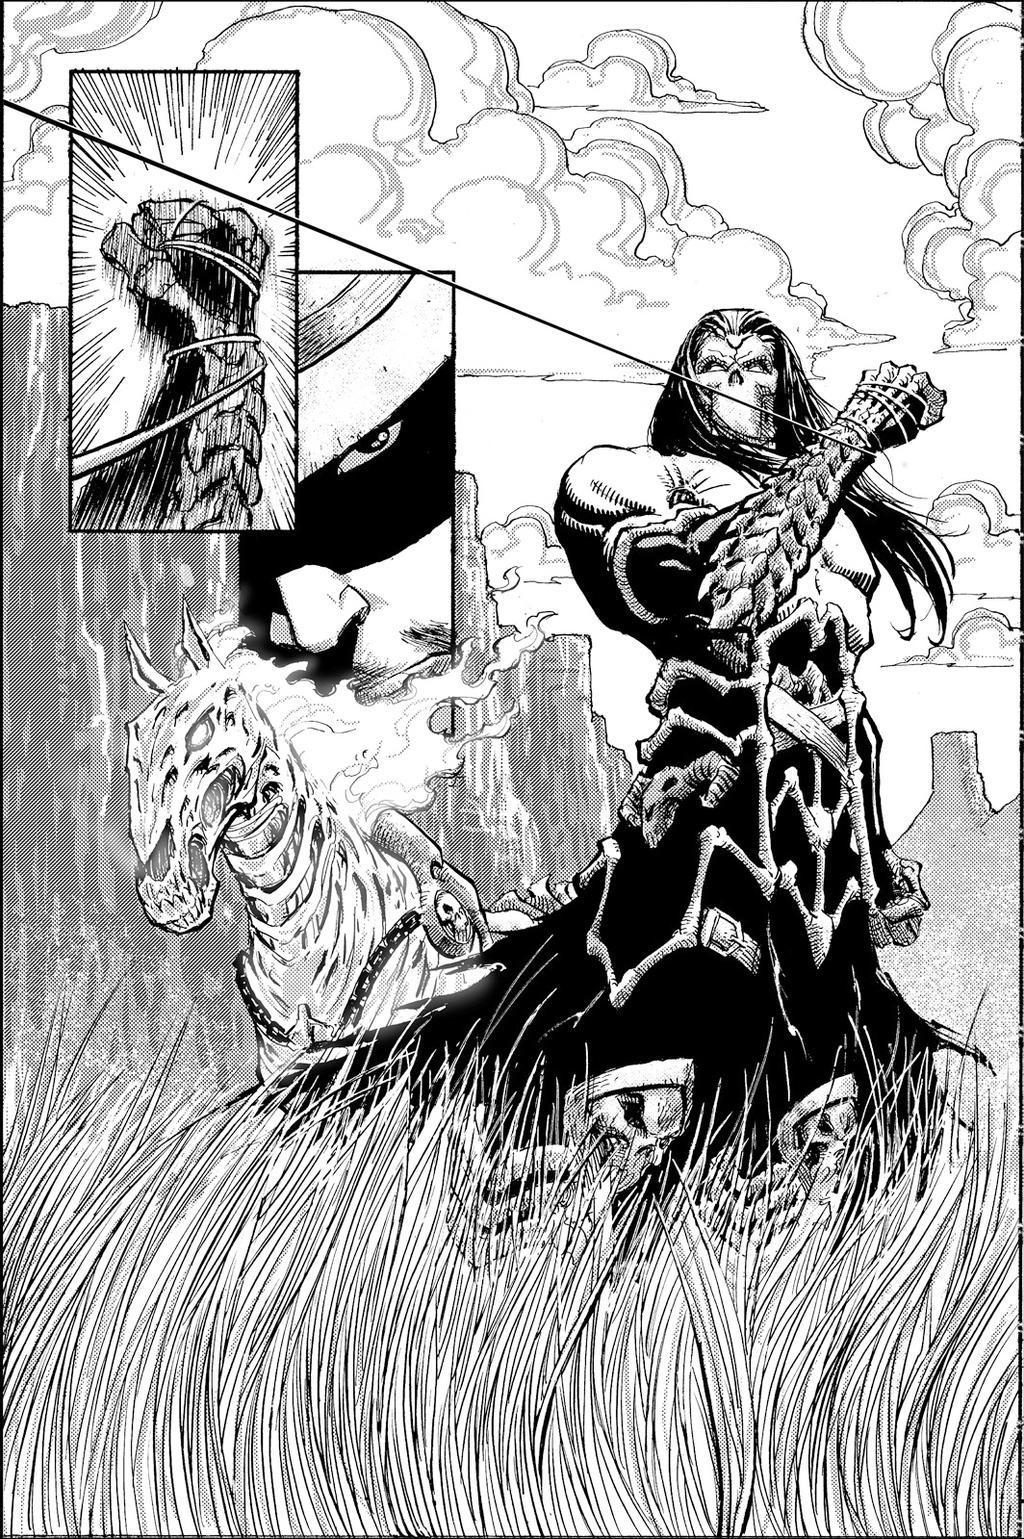 Darksiders ll 2 pg 2 by Roger-Robinson